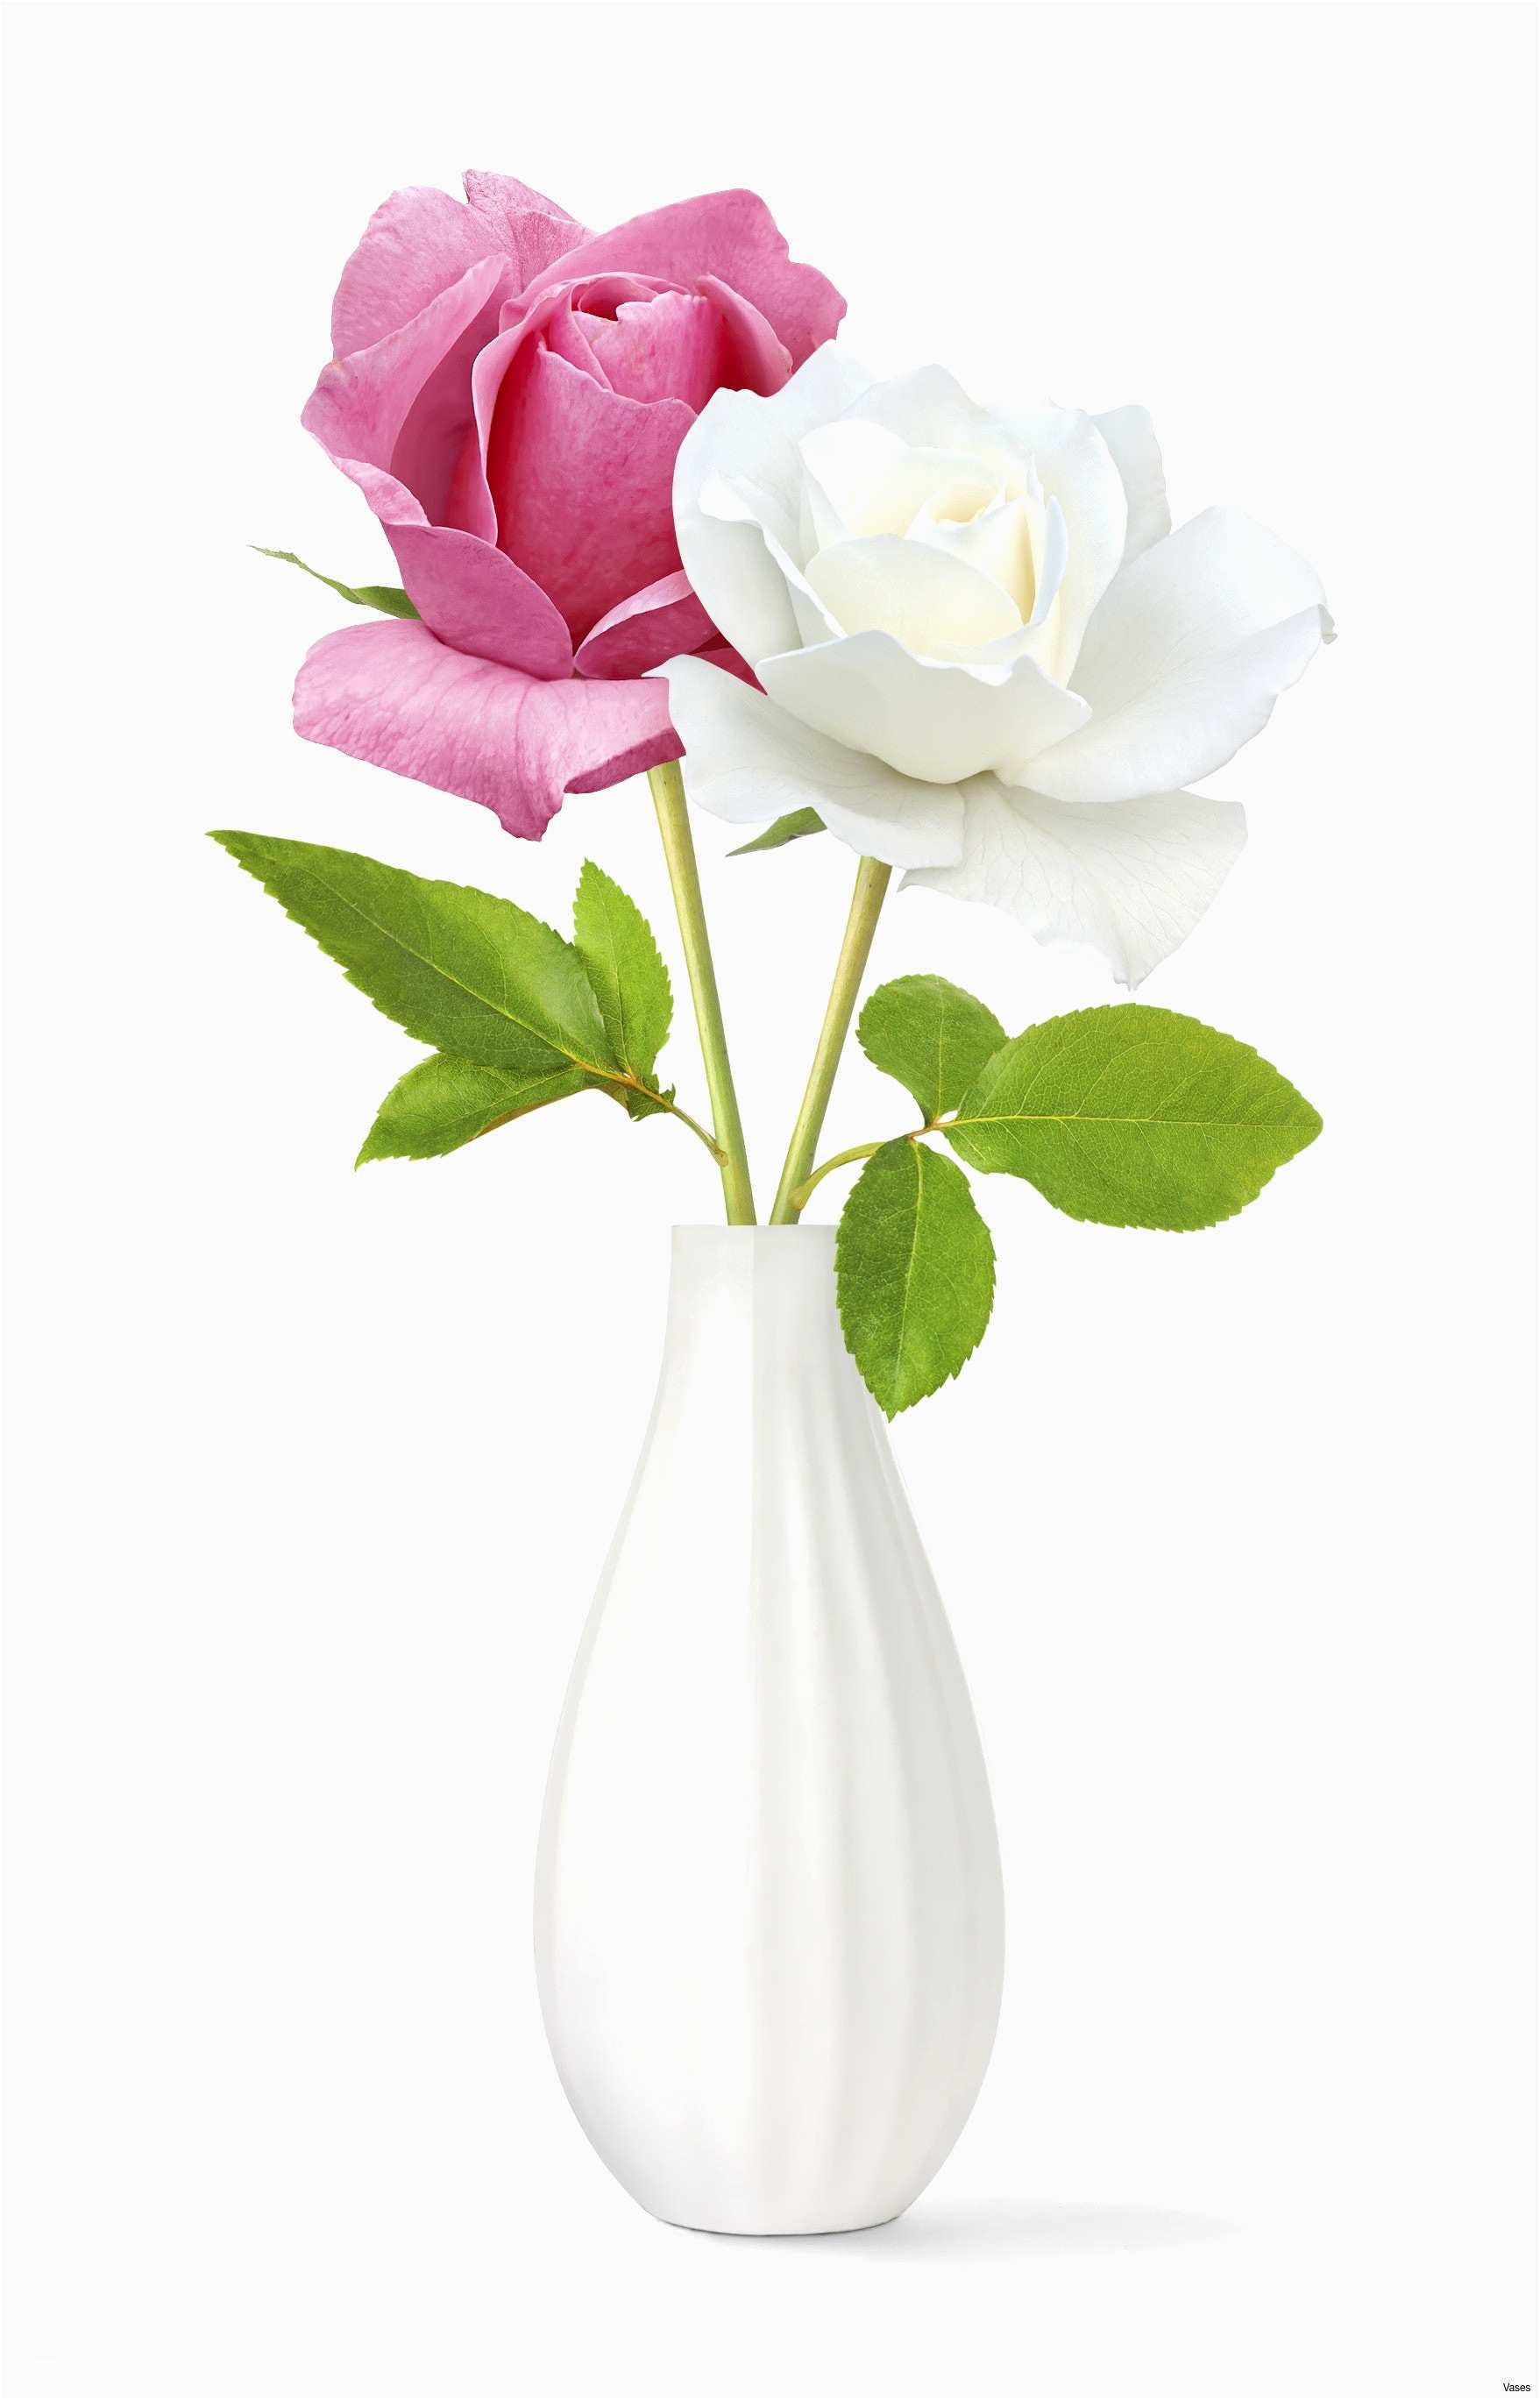 Happy Birthday Flowers Best Roses Red In A Vase Singleh Vases Rose Single I